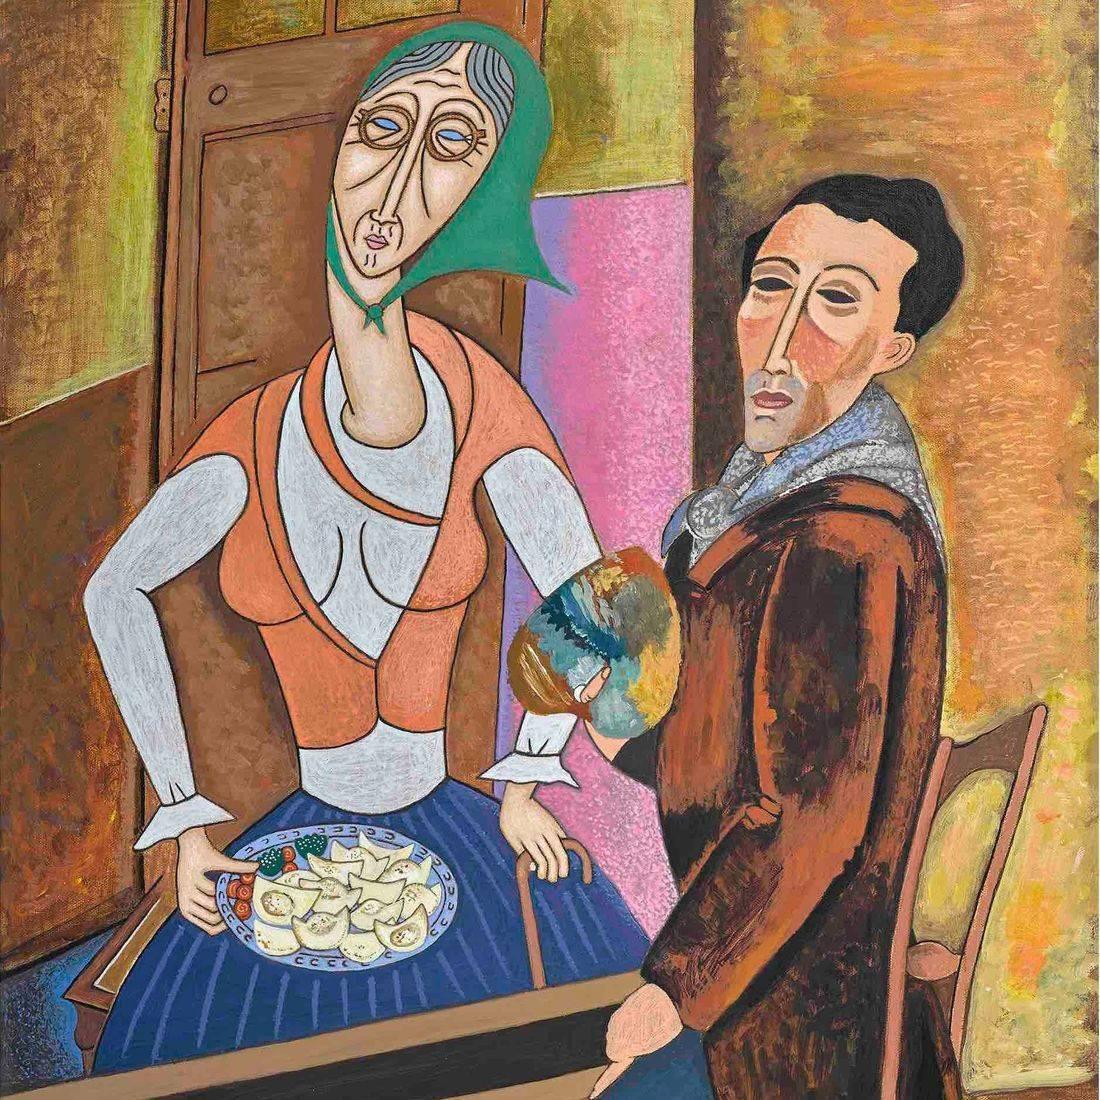 Modigliani, Grandmother, Pierogies, Polish Culture, Homage, Famous Artists, Parody, Humor